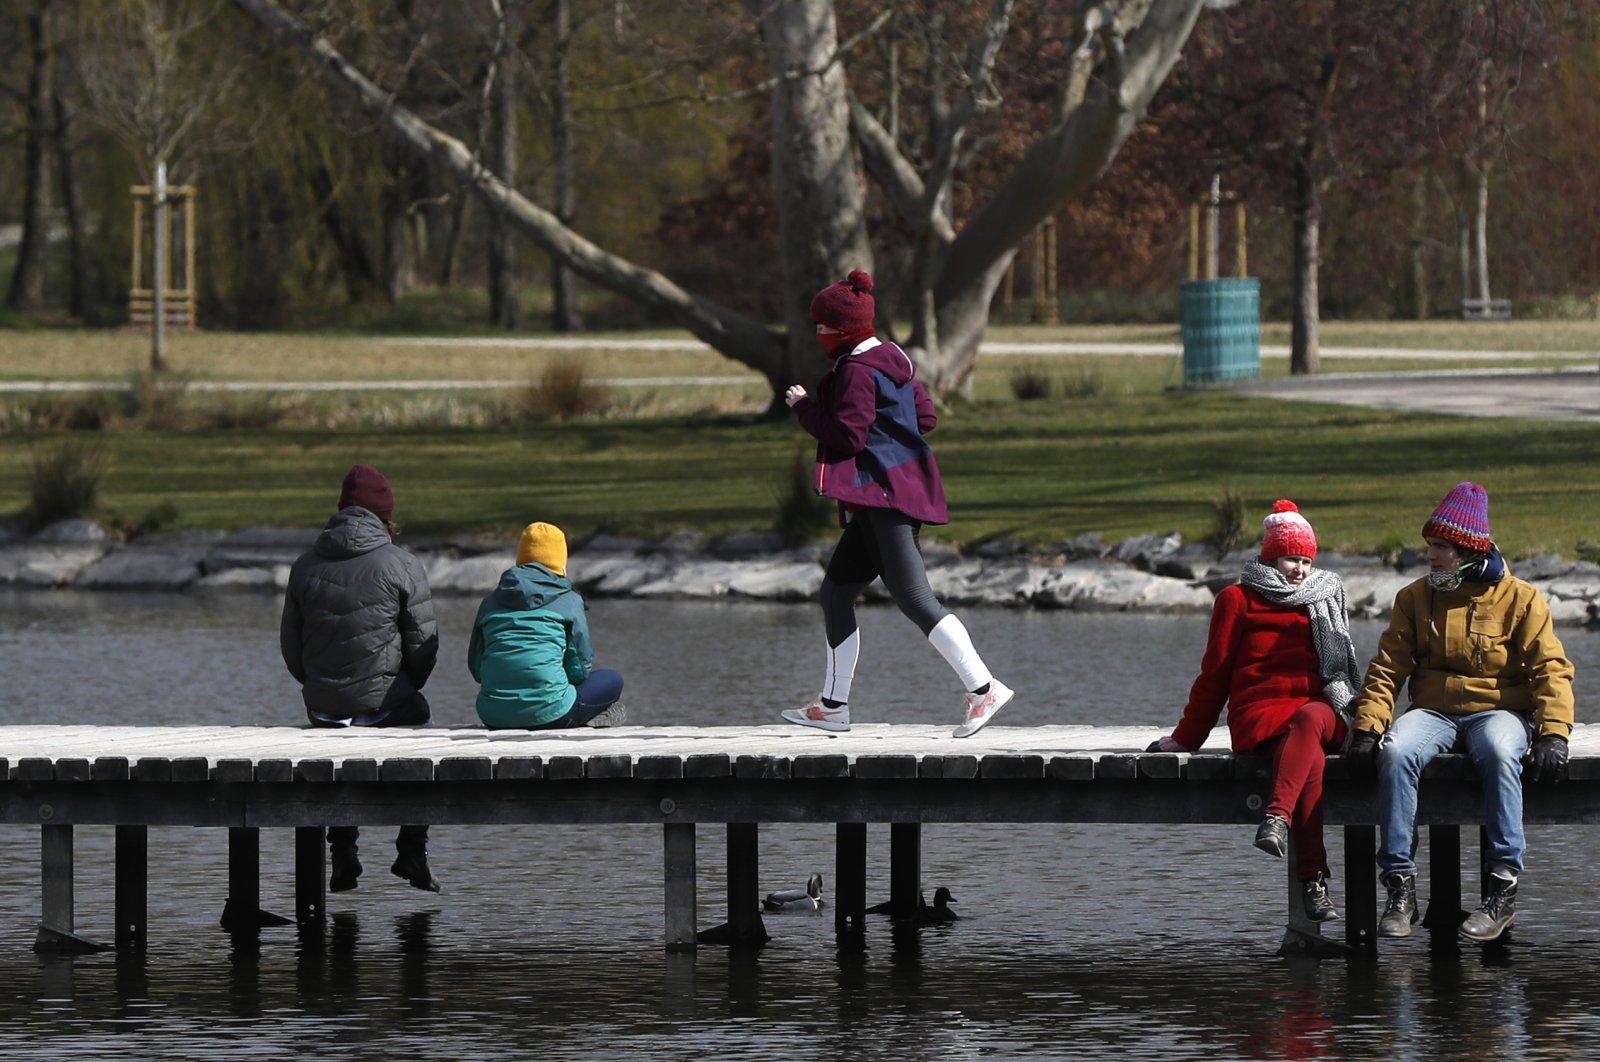 A young woman wearing a face mask runs across a wooden bridge in a park, Prague, Czechia, March 22, 2020. (AP Photo)